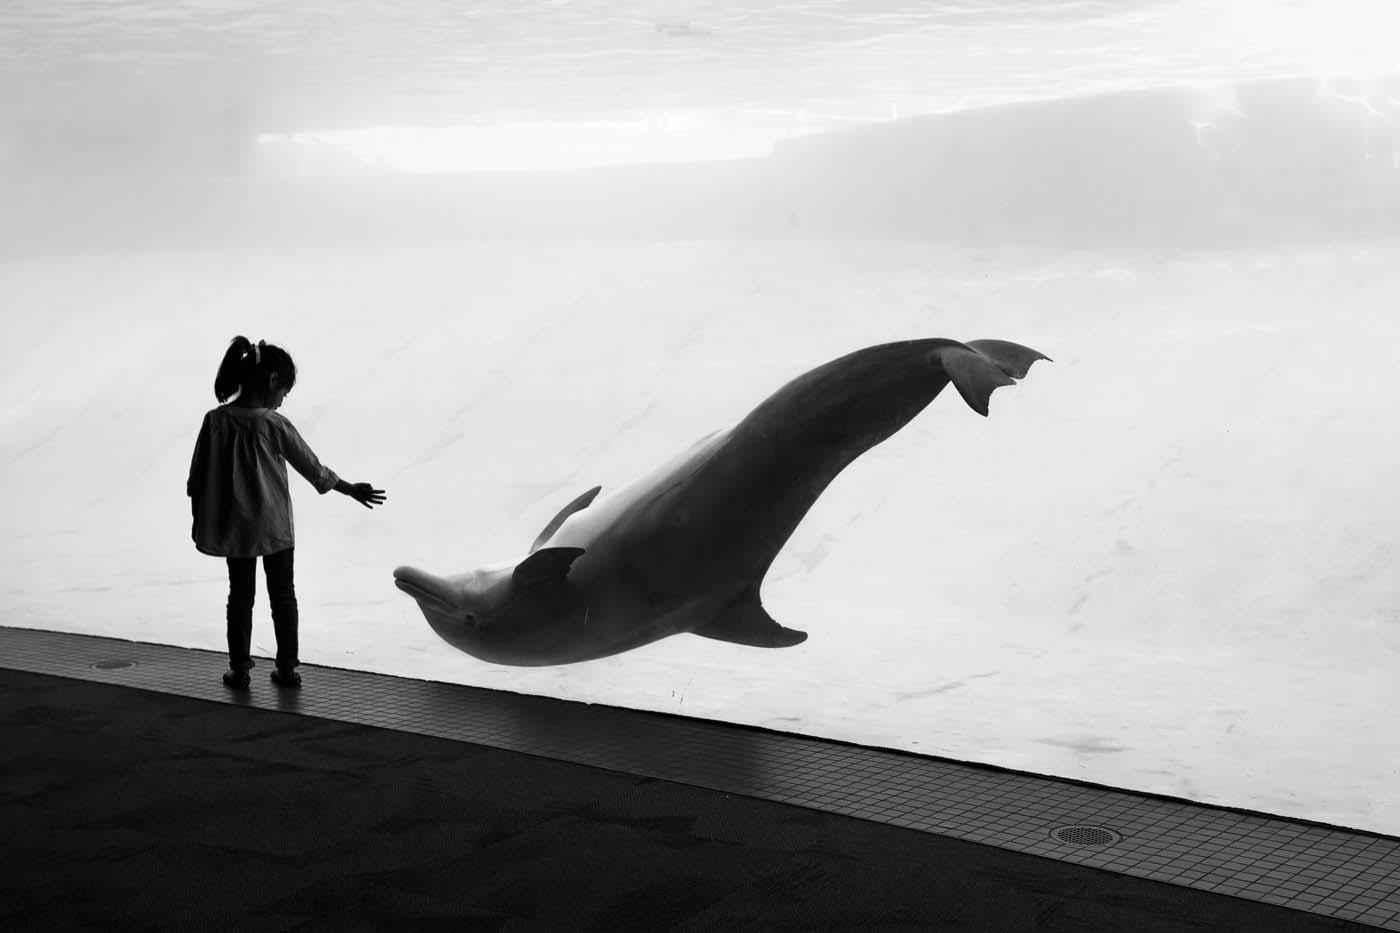 A Harmonious Encounter by Lindsay Moeser